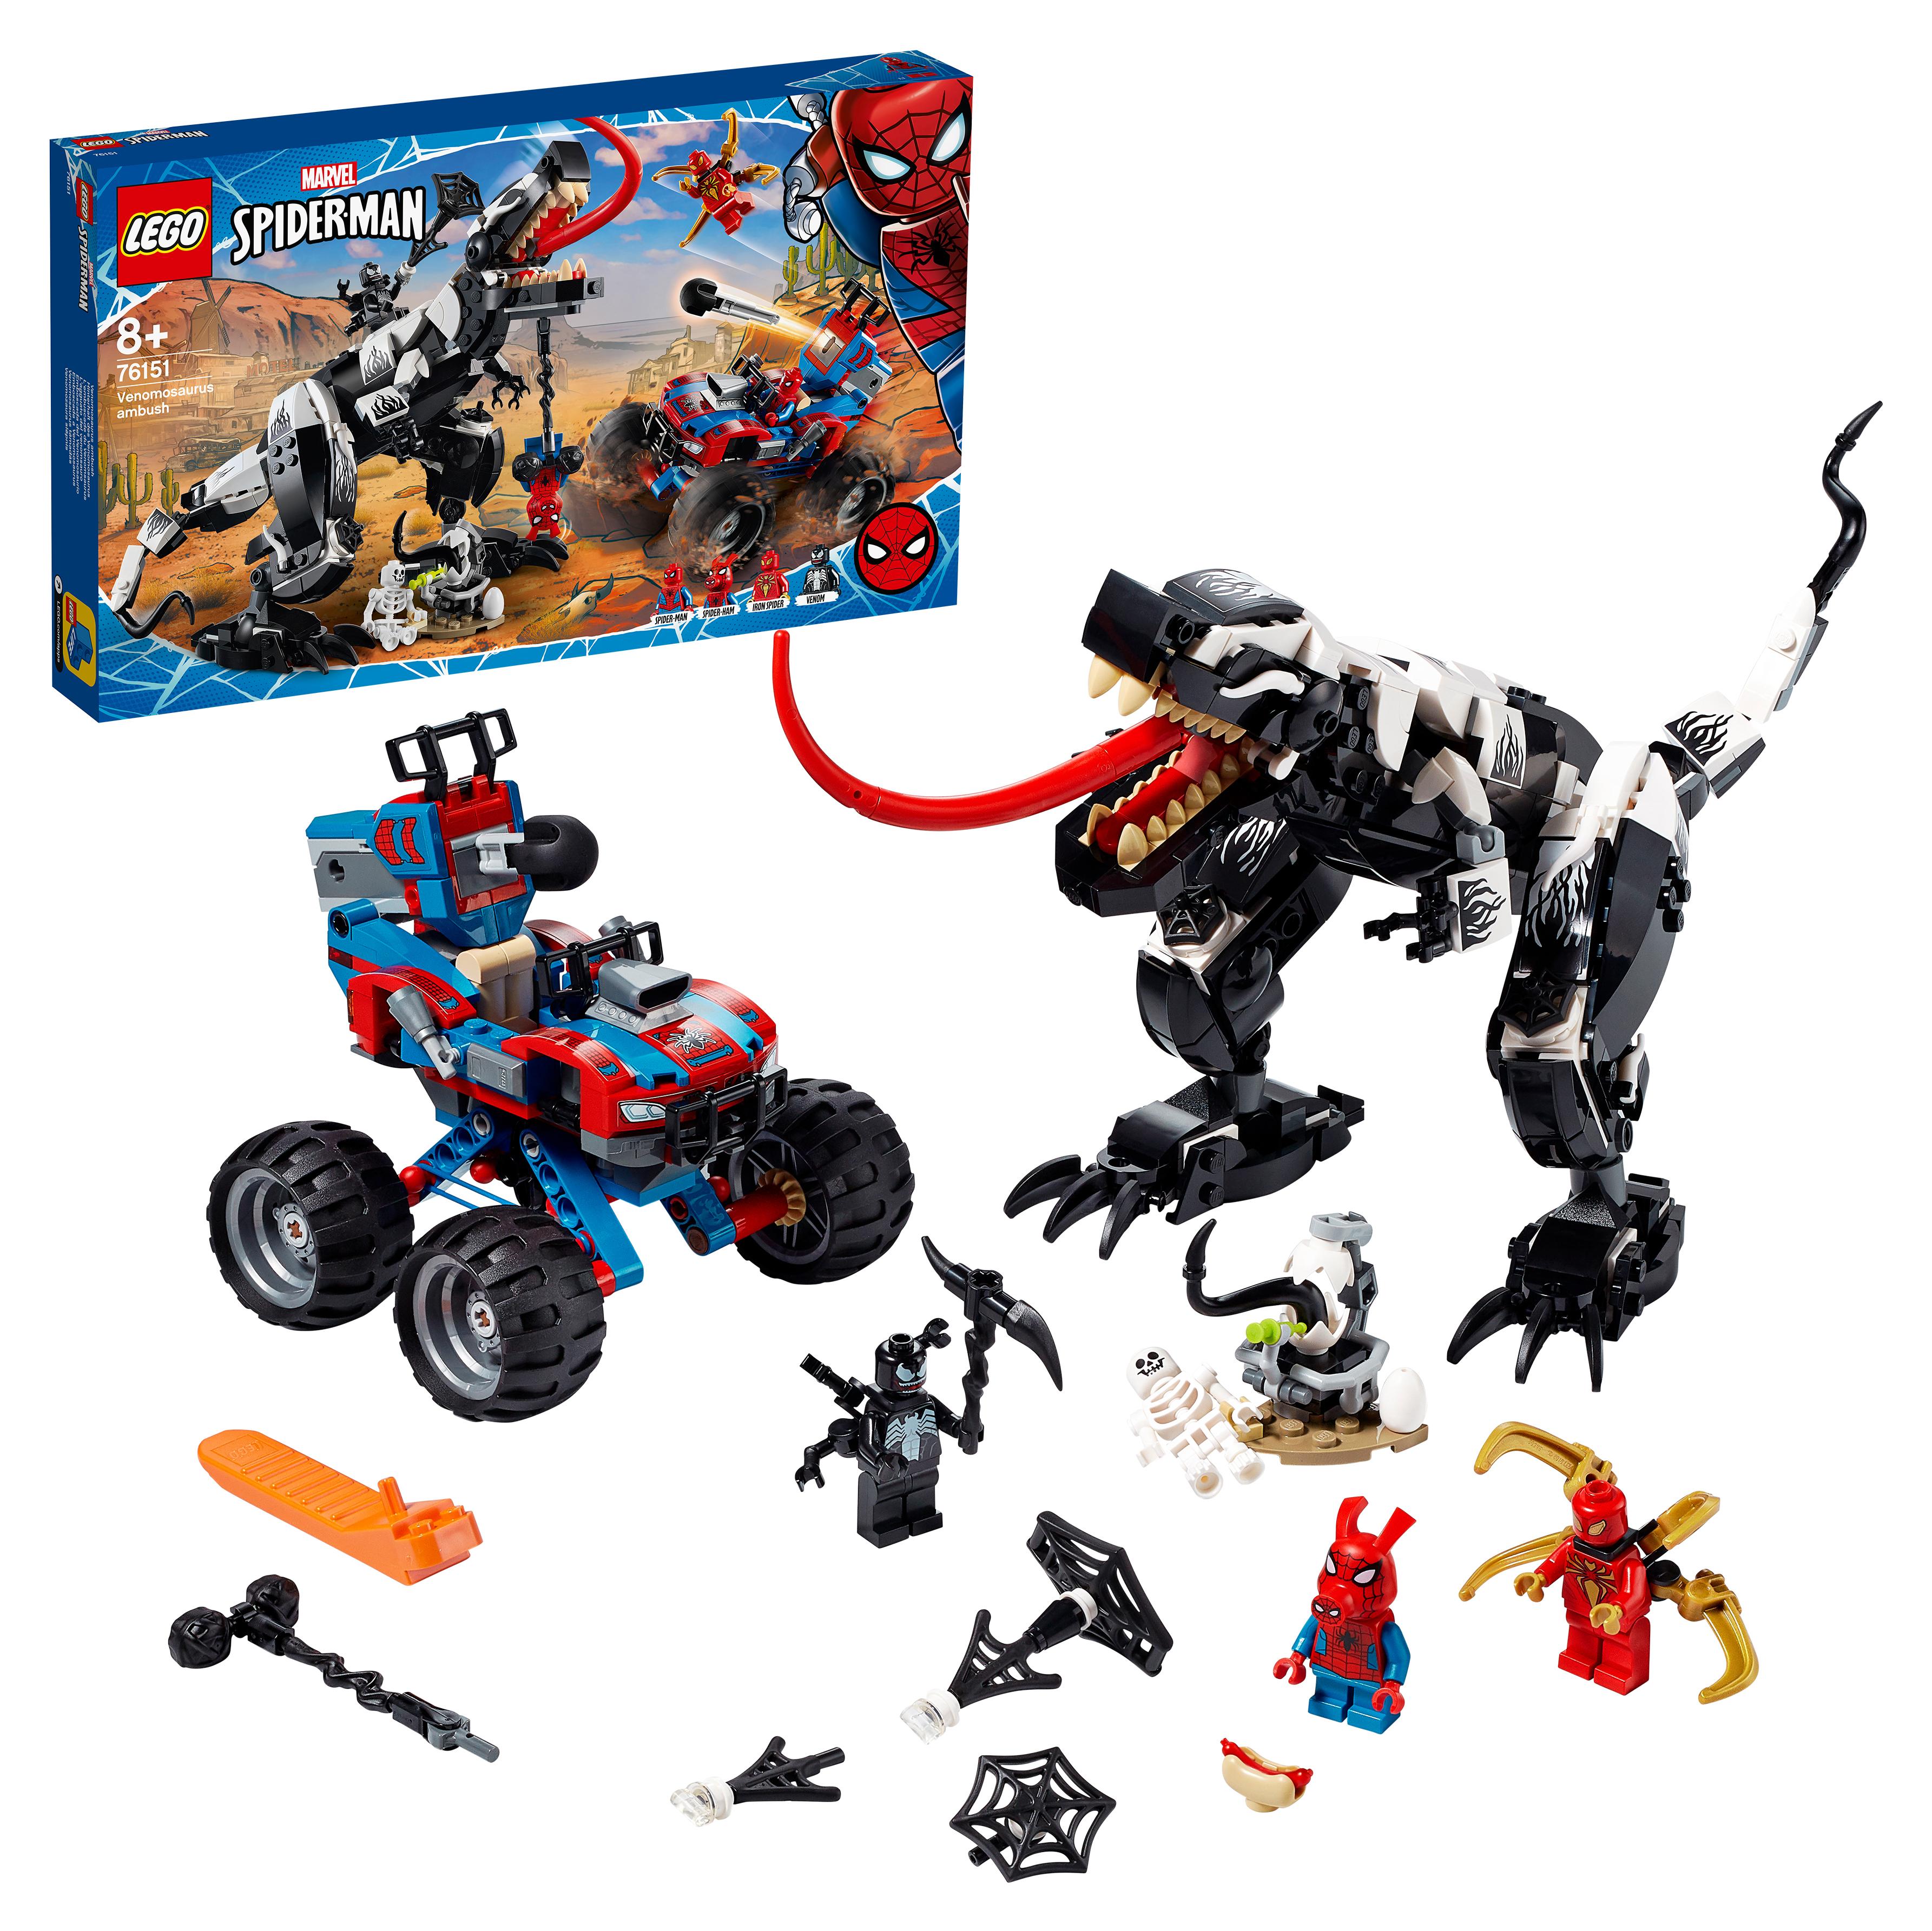 Конструктор LEGO Marvel Super Heroes 76151 Человек